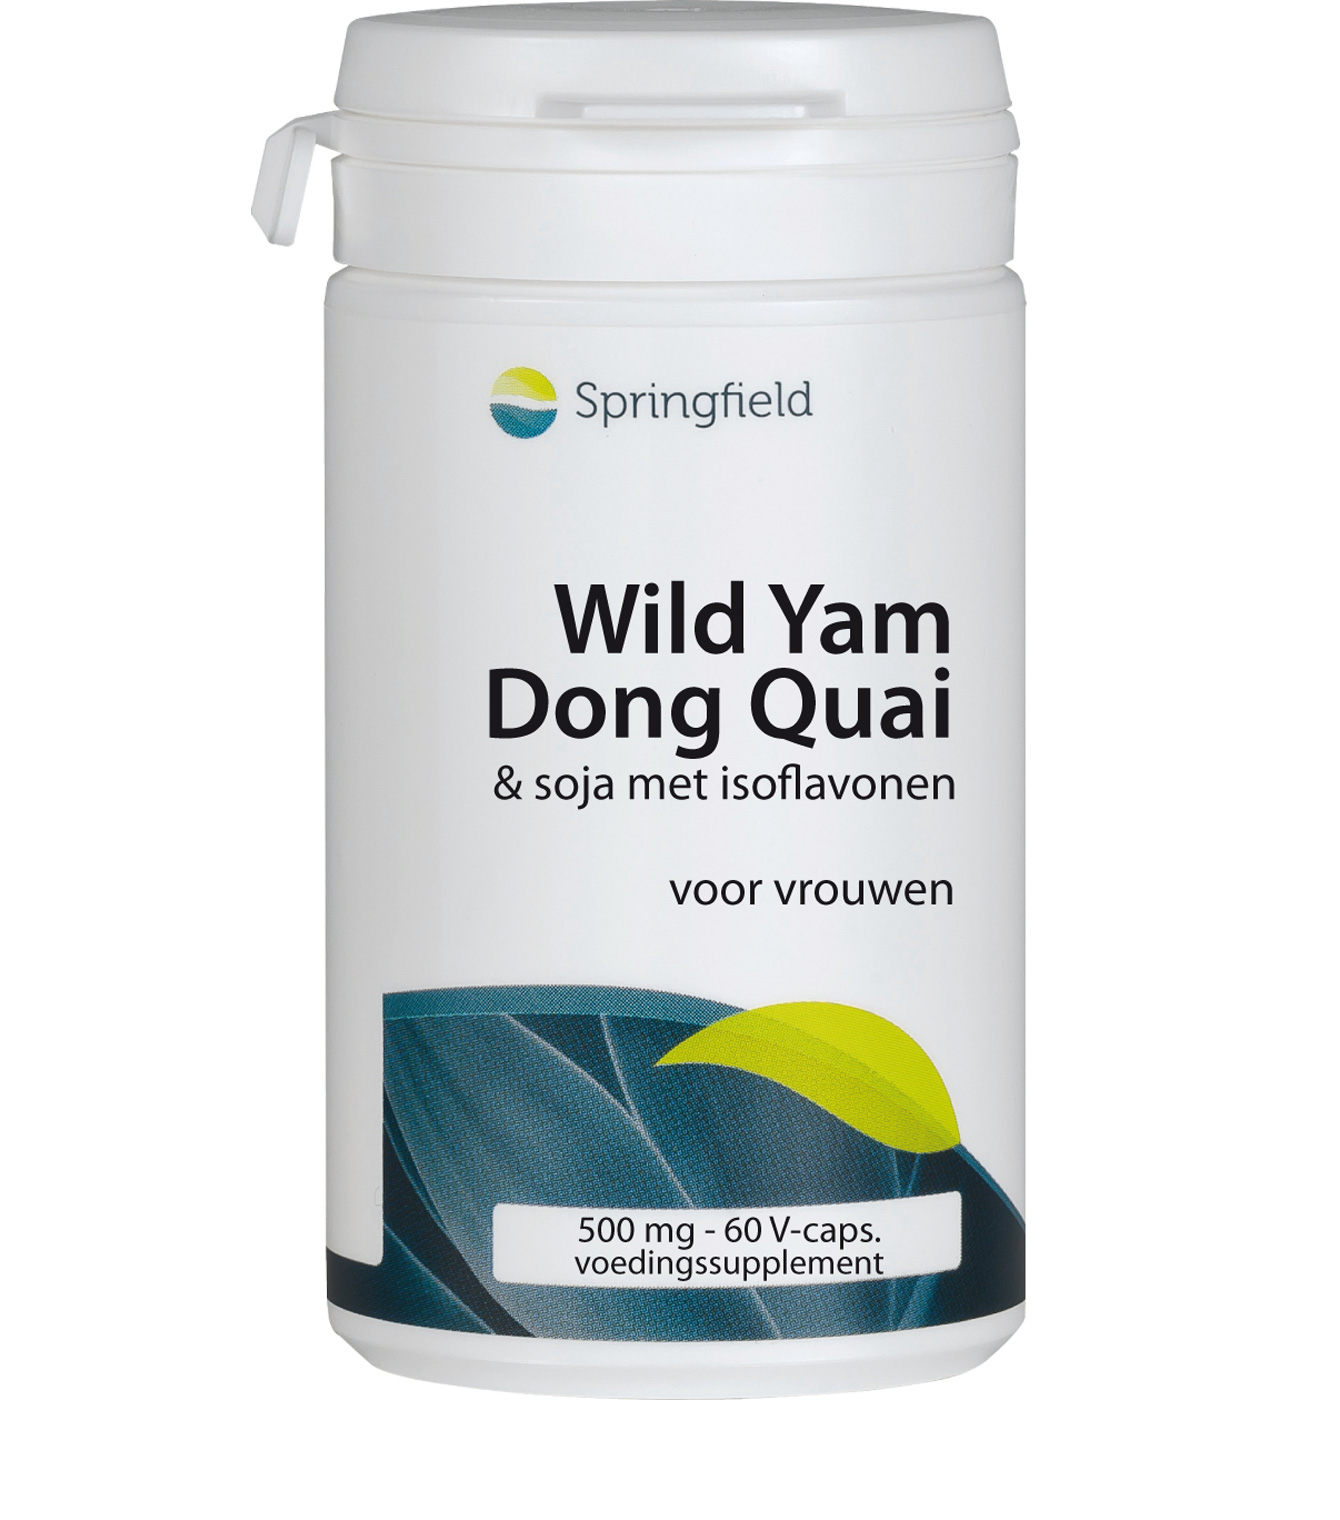 Wild Yam - Dong Quai